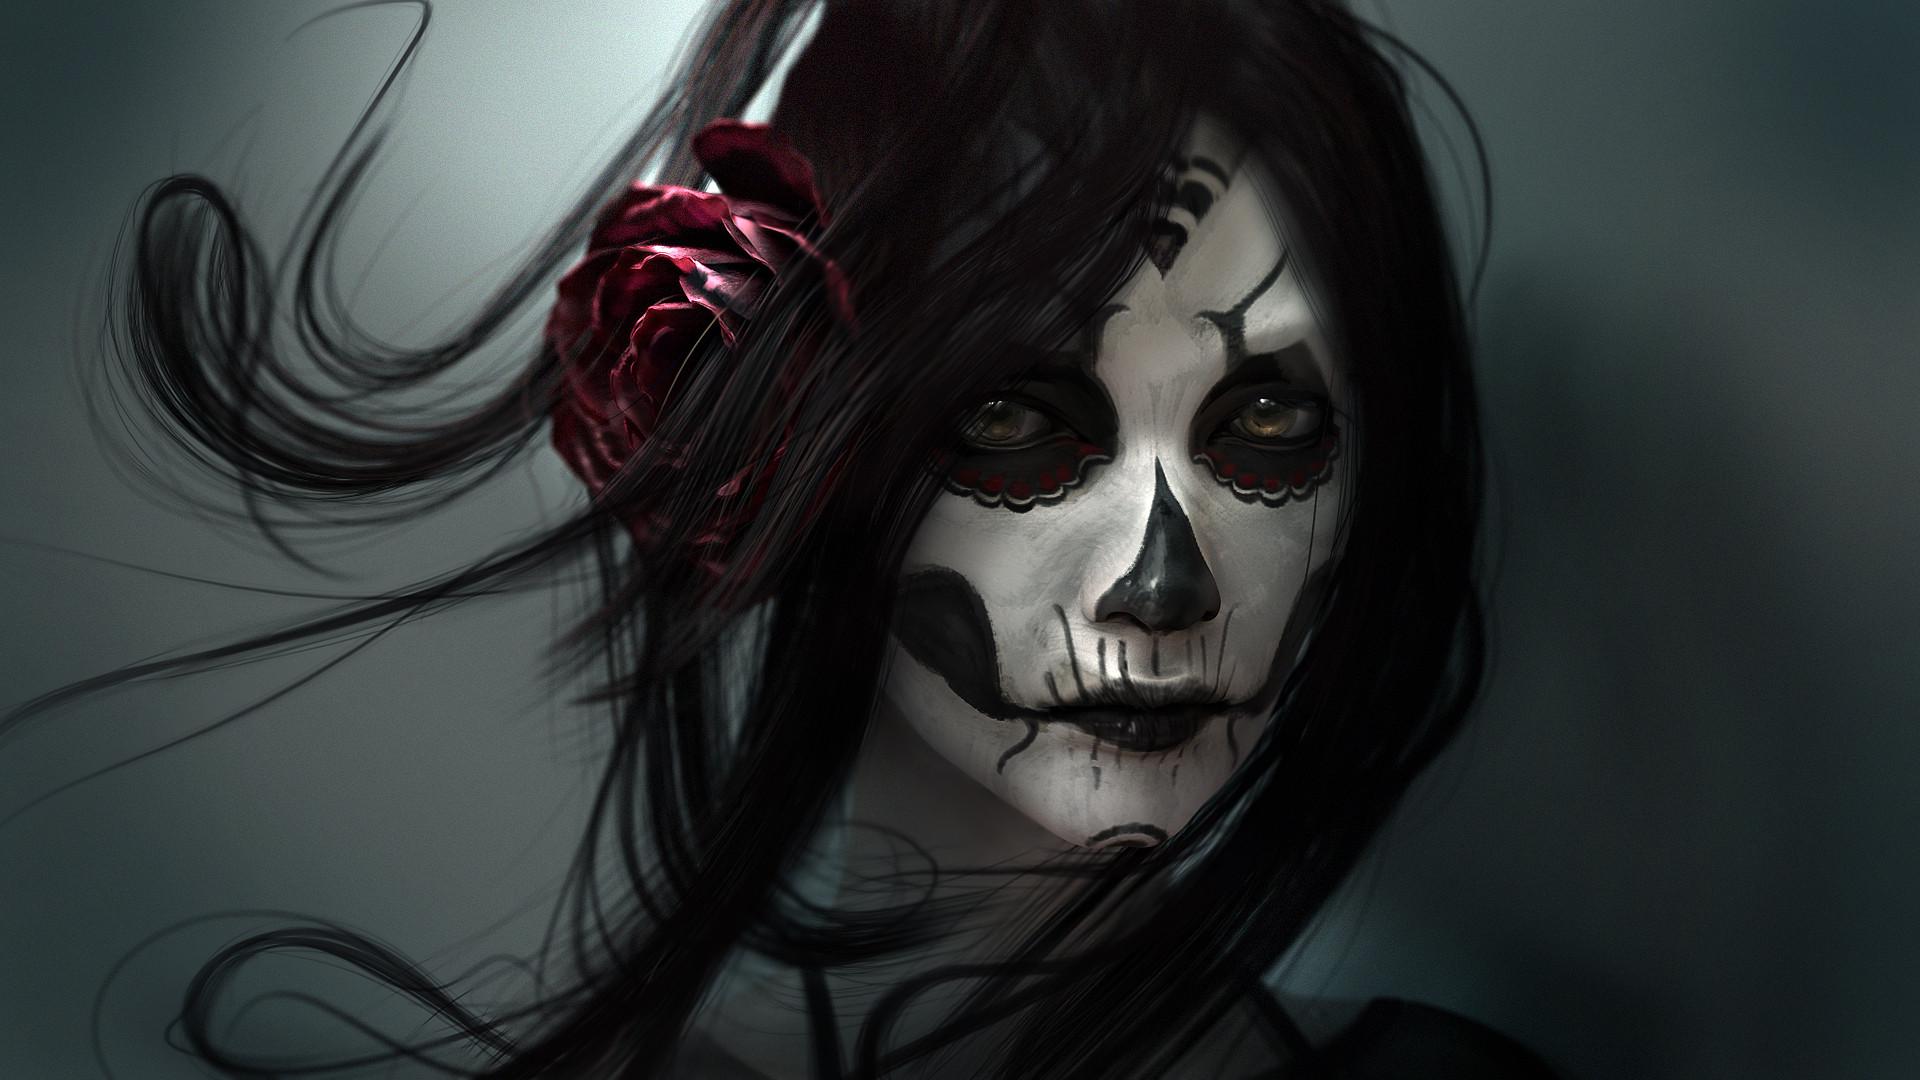 Wallpaper skull makeup 1920x1080